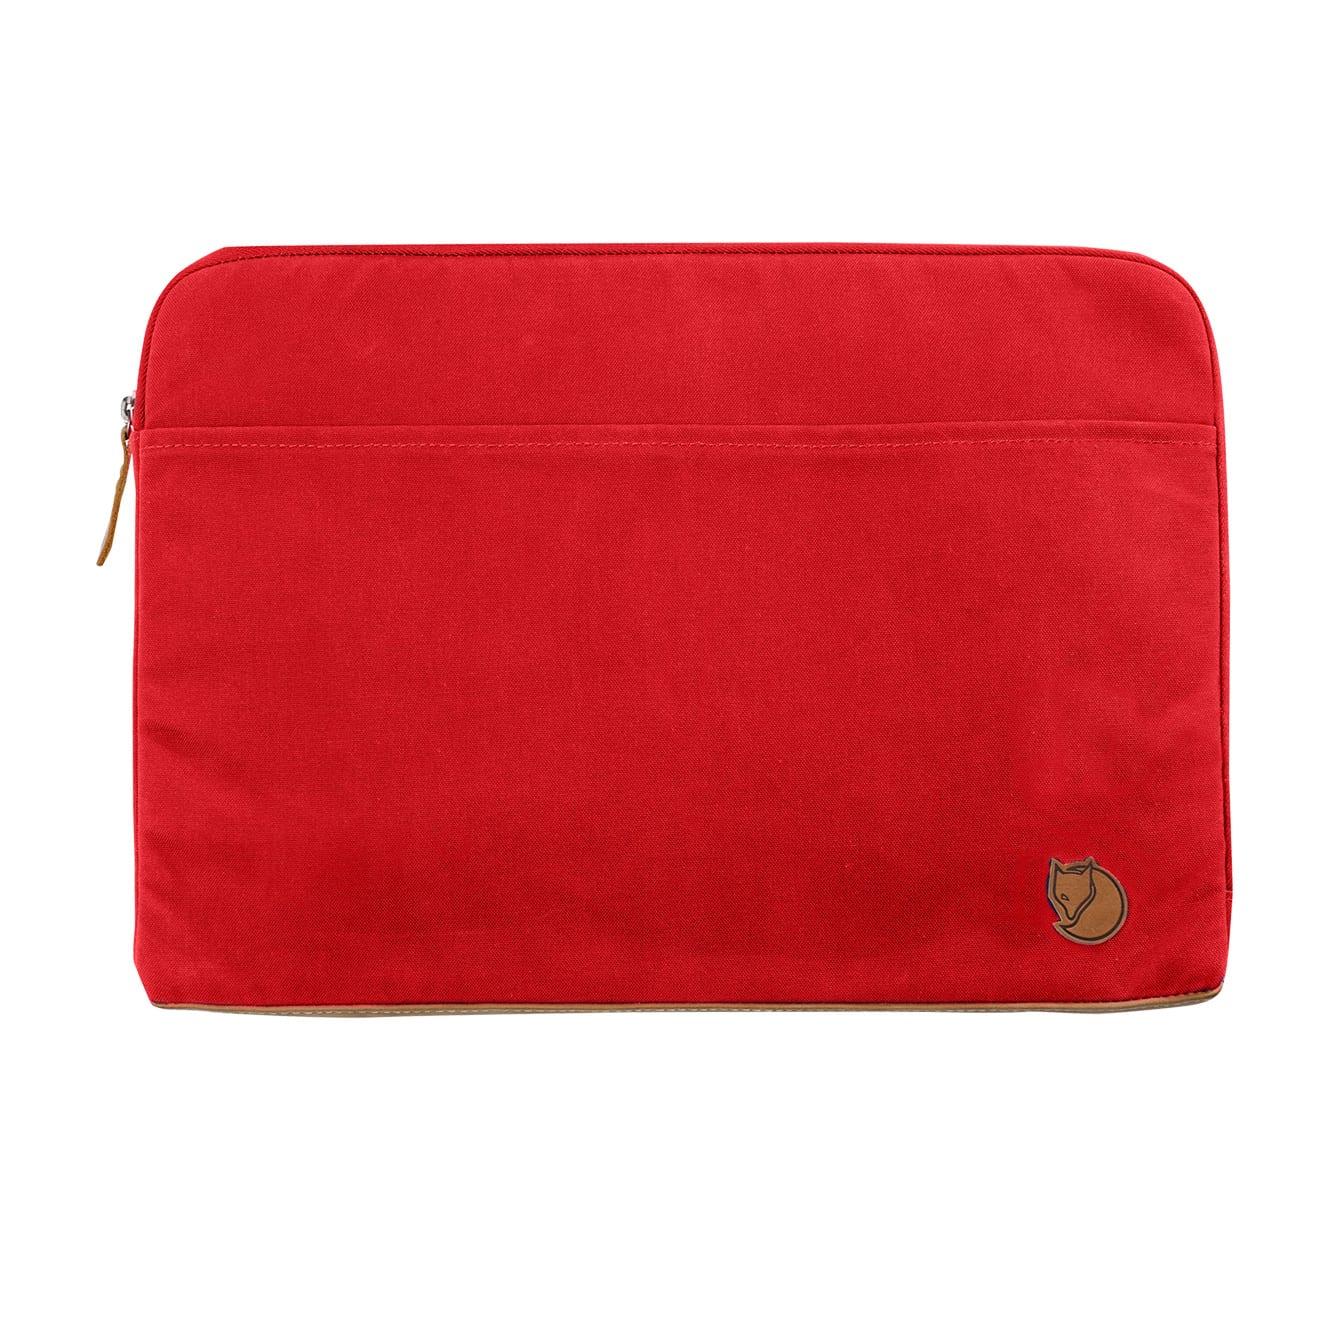 "Fjallraven Laptop Case 15"" Red"